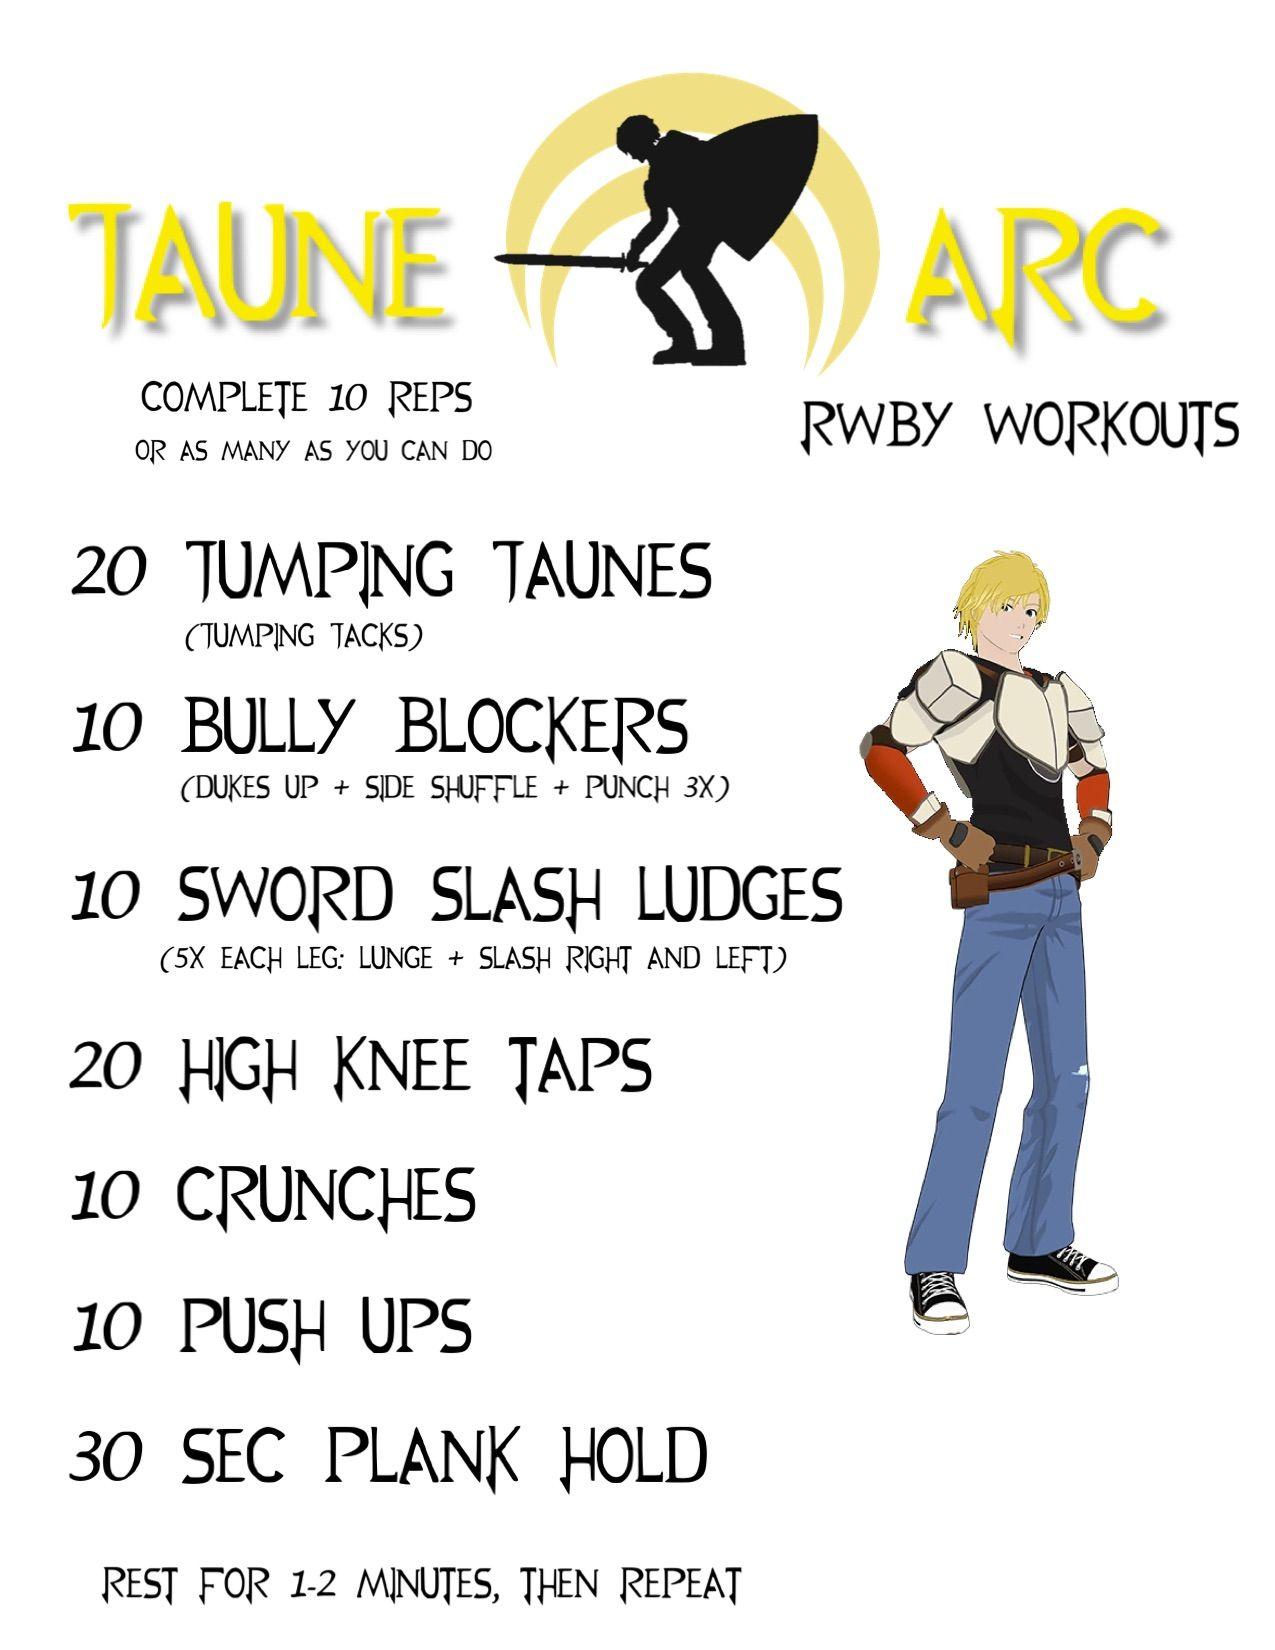 rwby workout